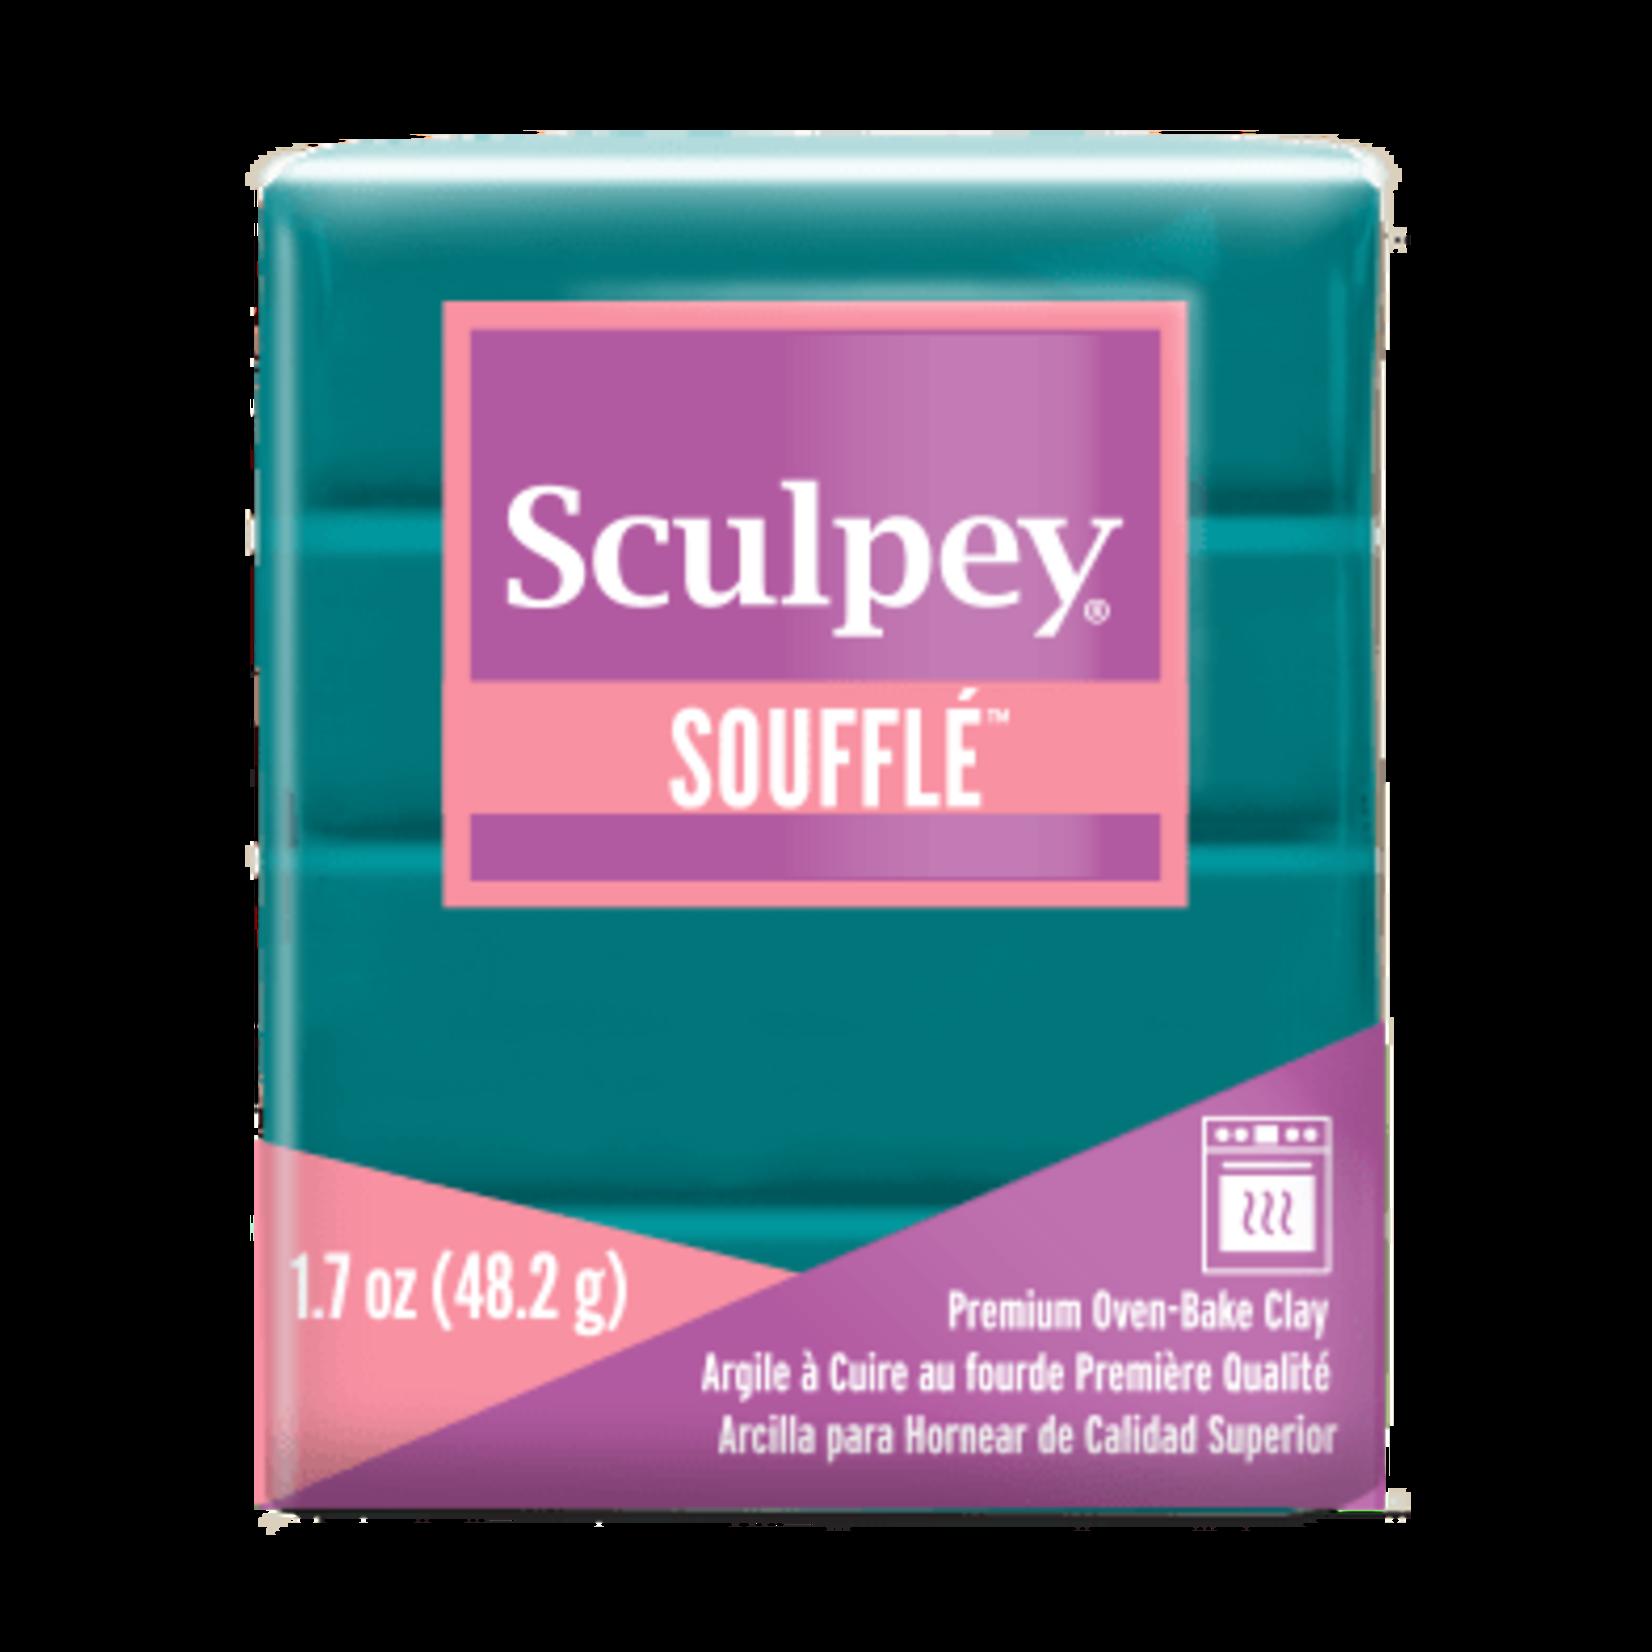 Sculpey Sculpey Souffle -- Sea Glass